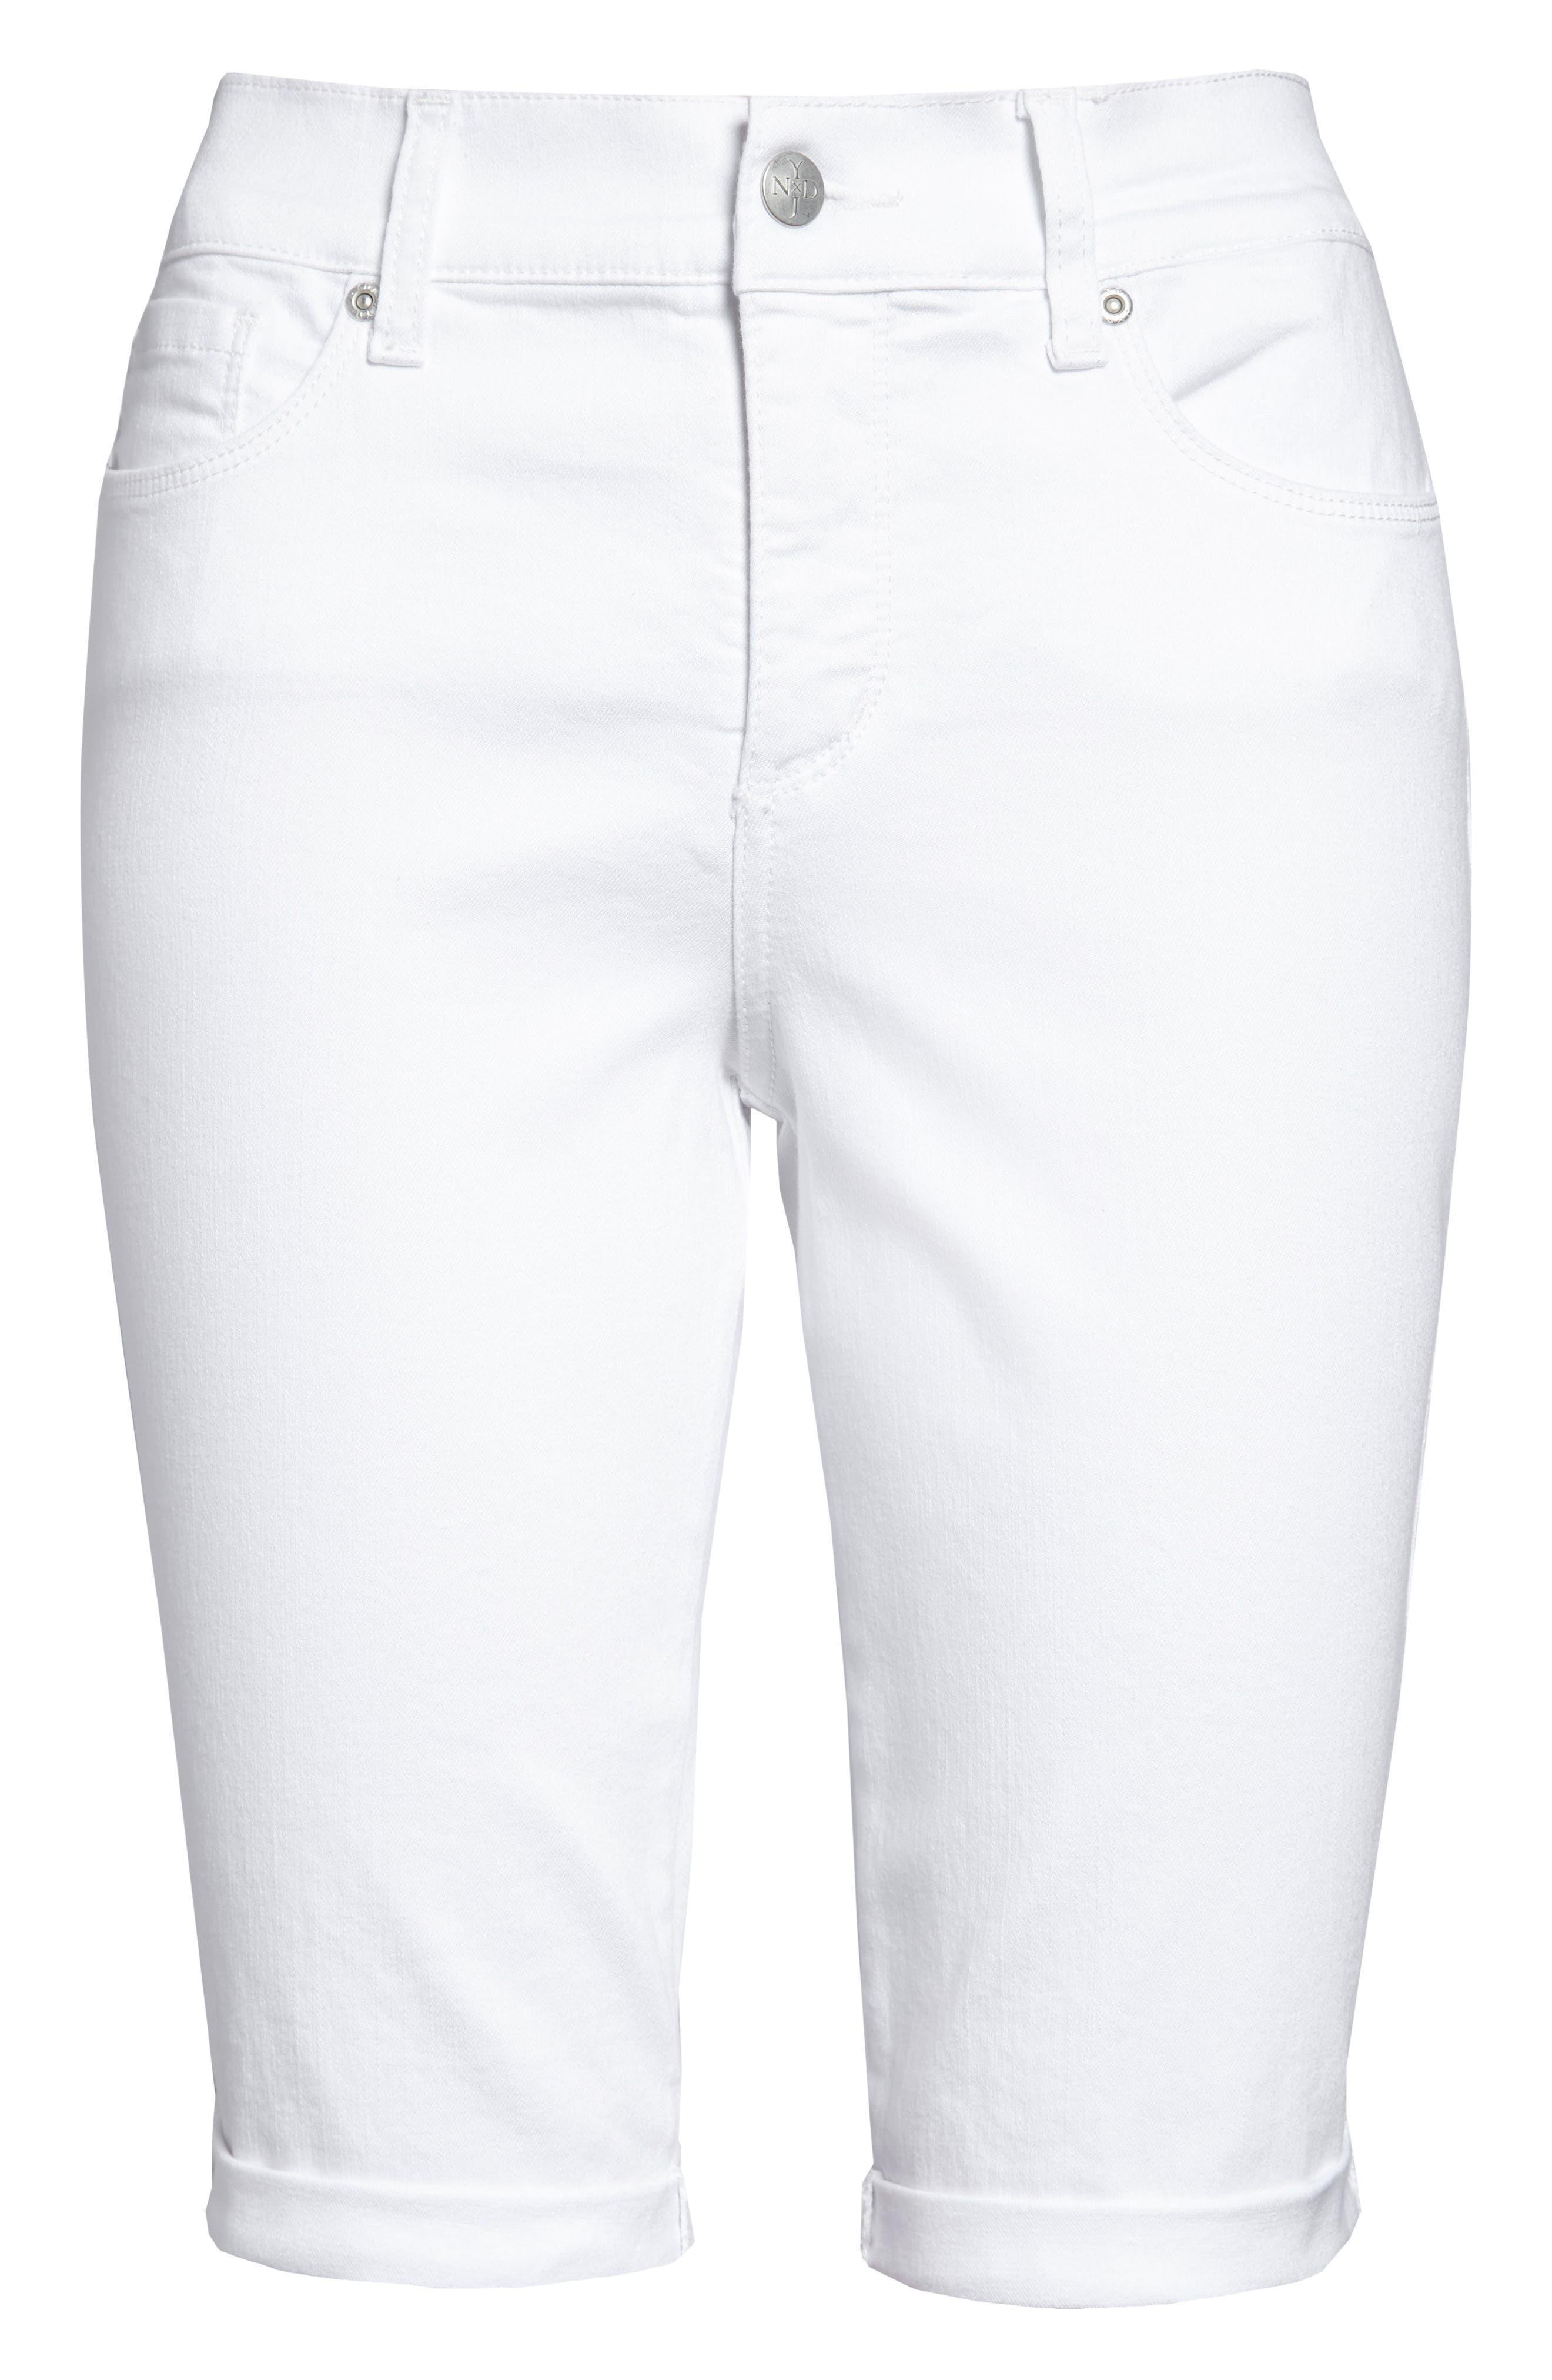 Briella Roll Cuff Bermuda Shorts,                             Alternate thumbnail 4, color,                             103